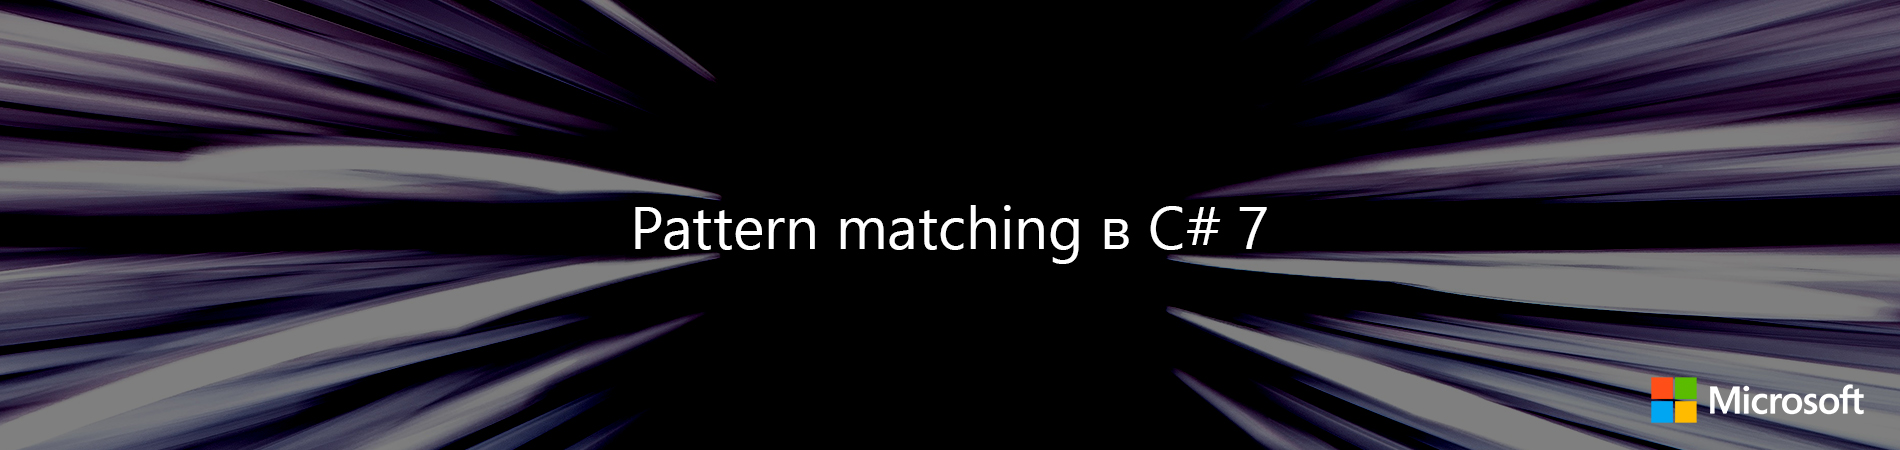 Pattern matching in C # 7